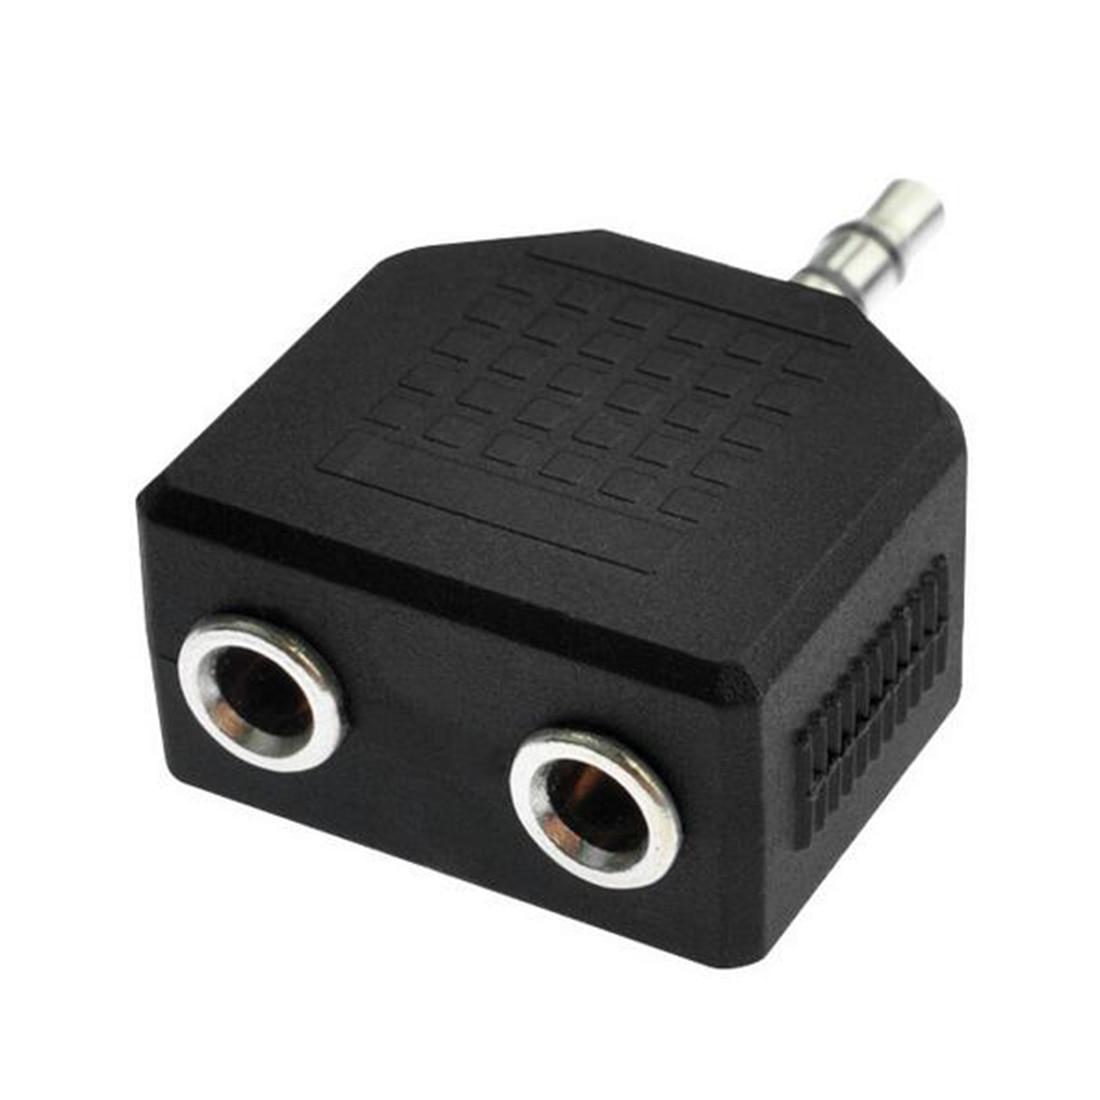 Marsnaska Gift Black Color 3 5mm 1 Male to 2 Female Double Earphone font b Headphone